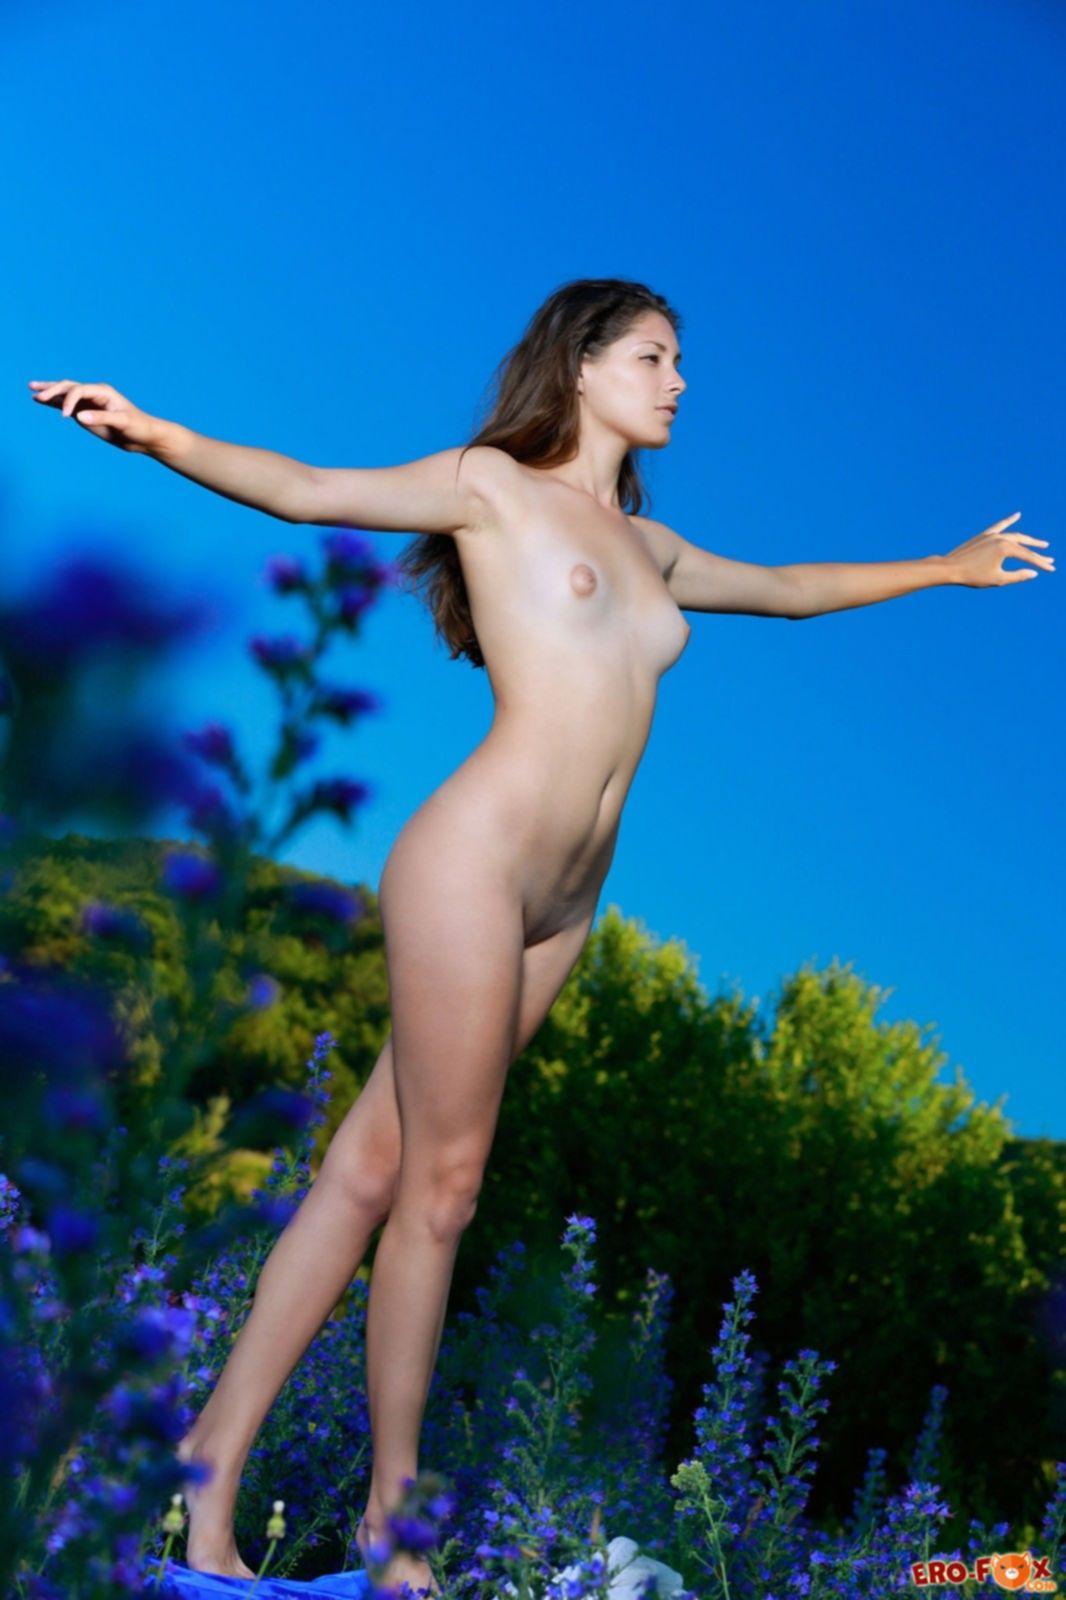 Девушка без трусиков встала раком на природе - фото